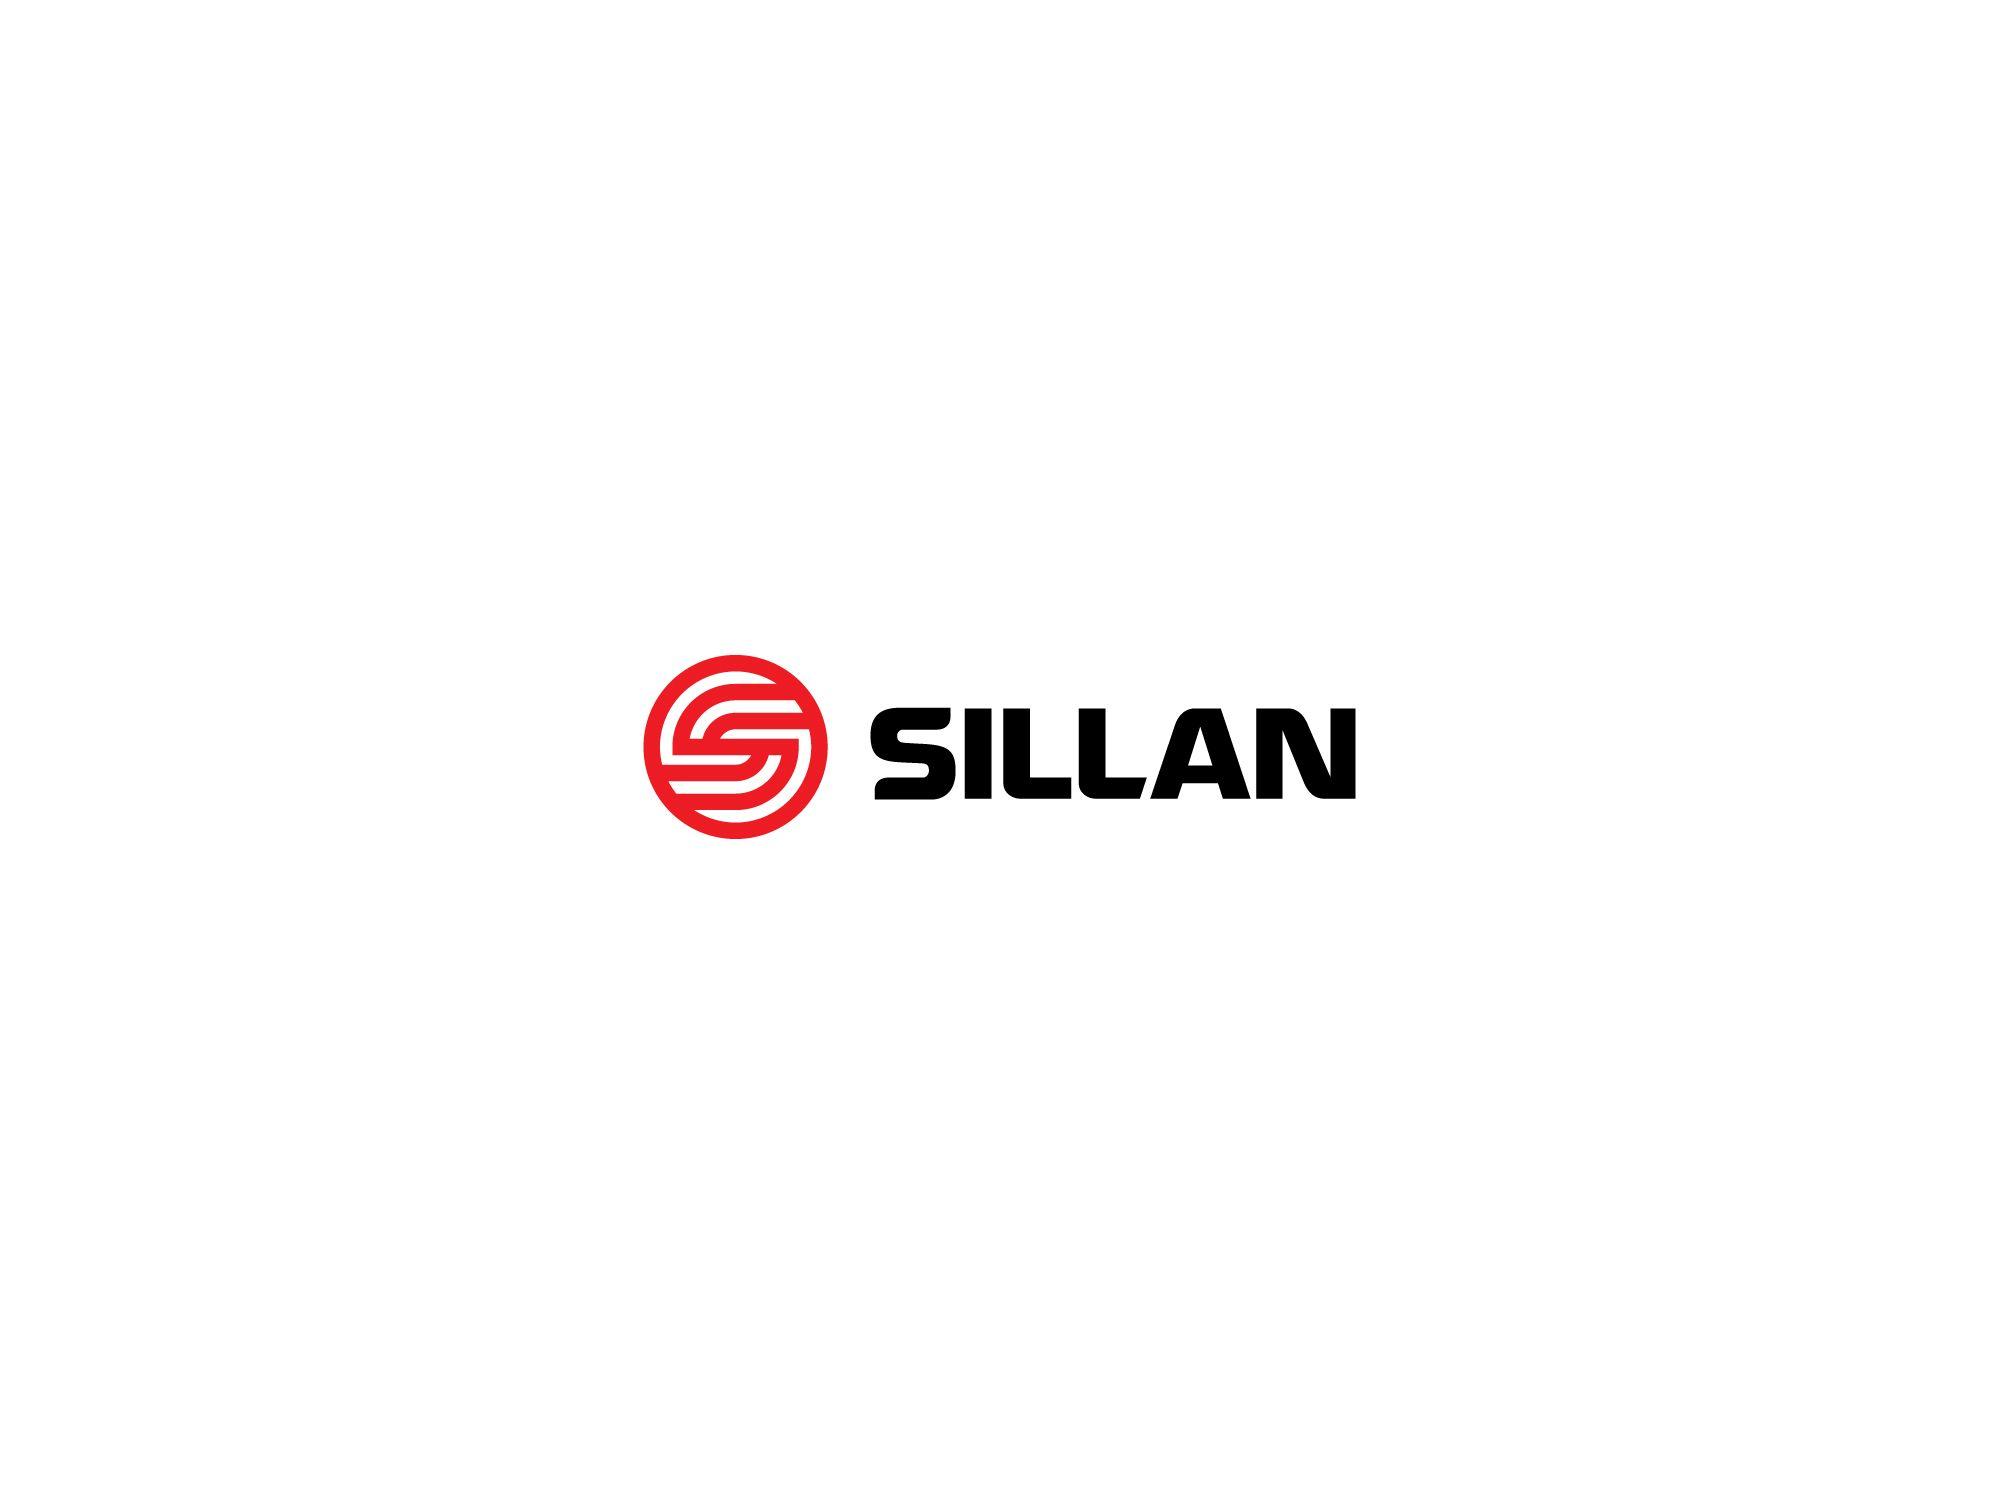 Логотип для Sillan - дизайнер shamaevserg